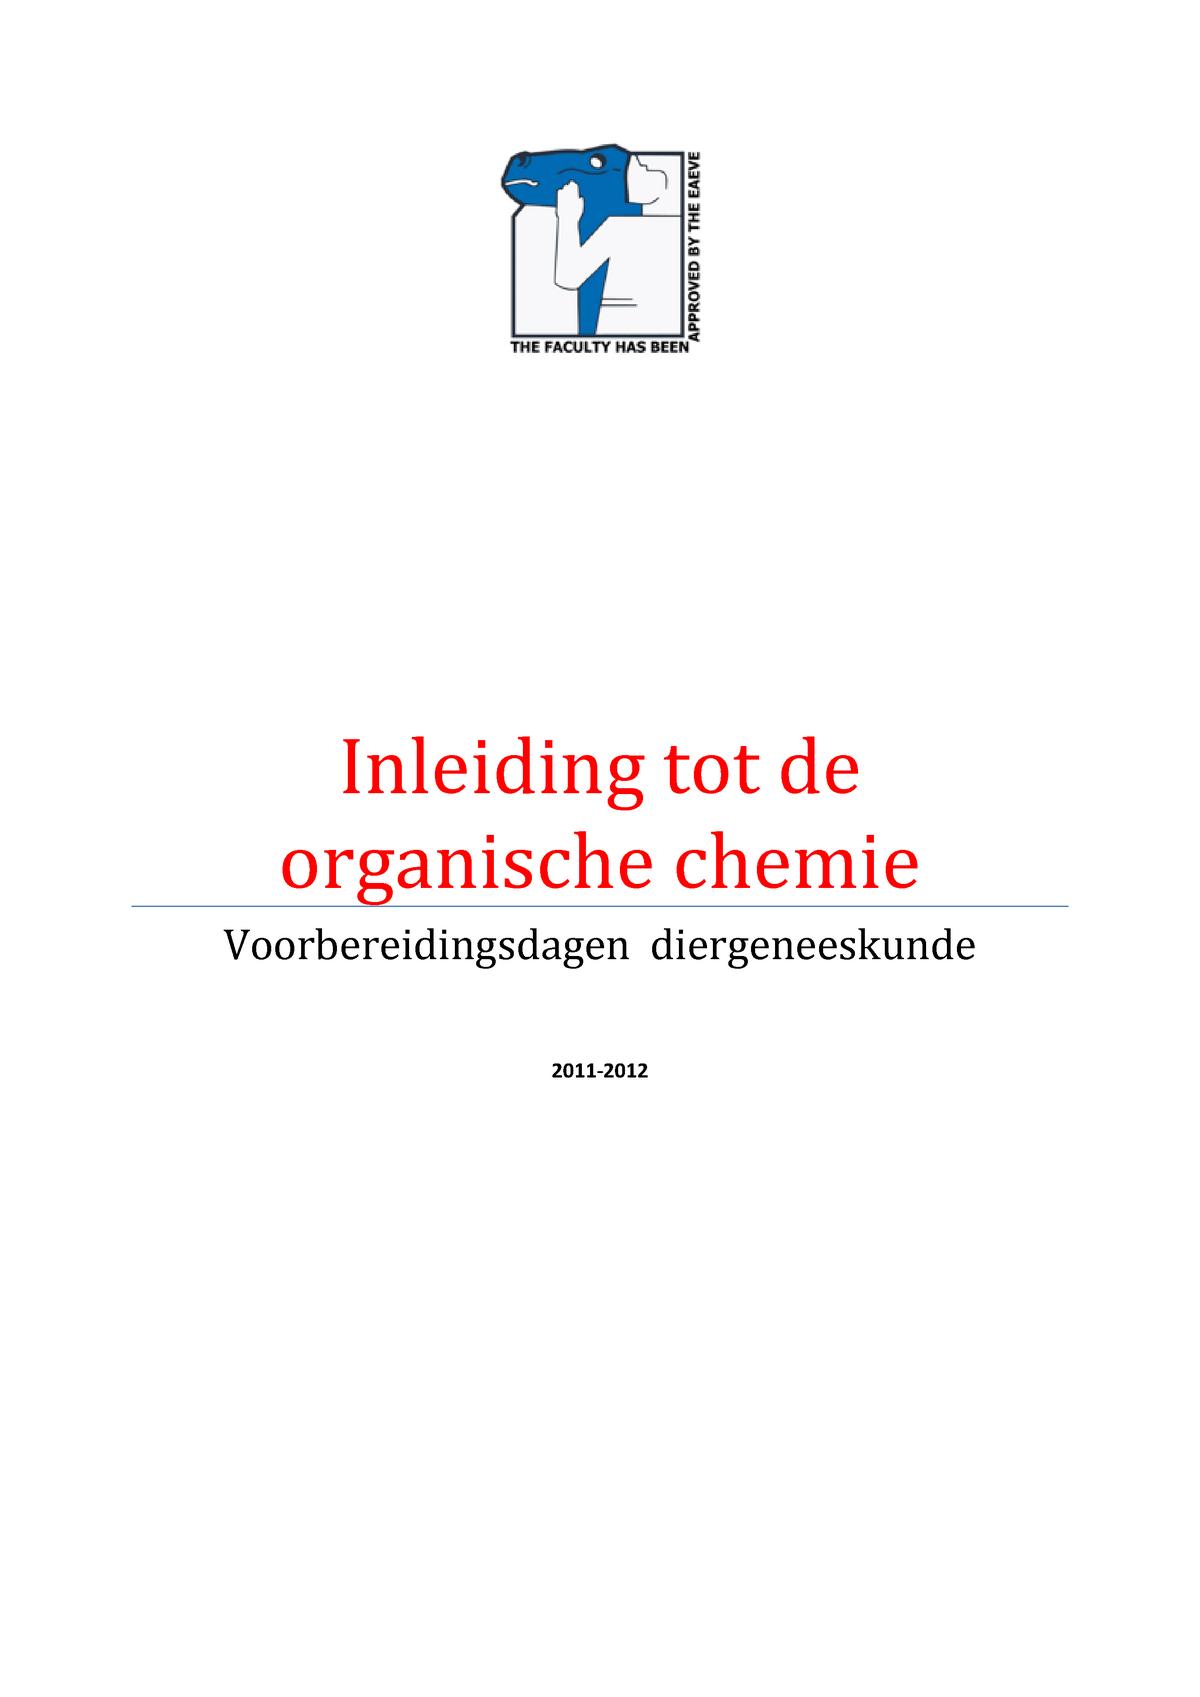 Inleiding Tot De Organische Chemie 2011 2012 1033fbdbmw